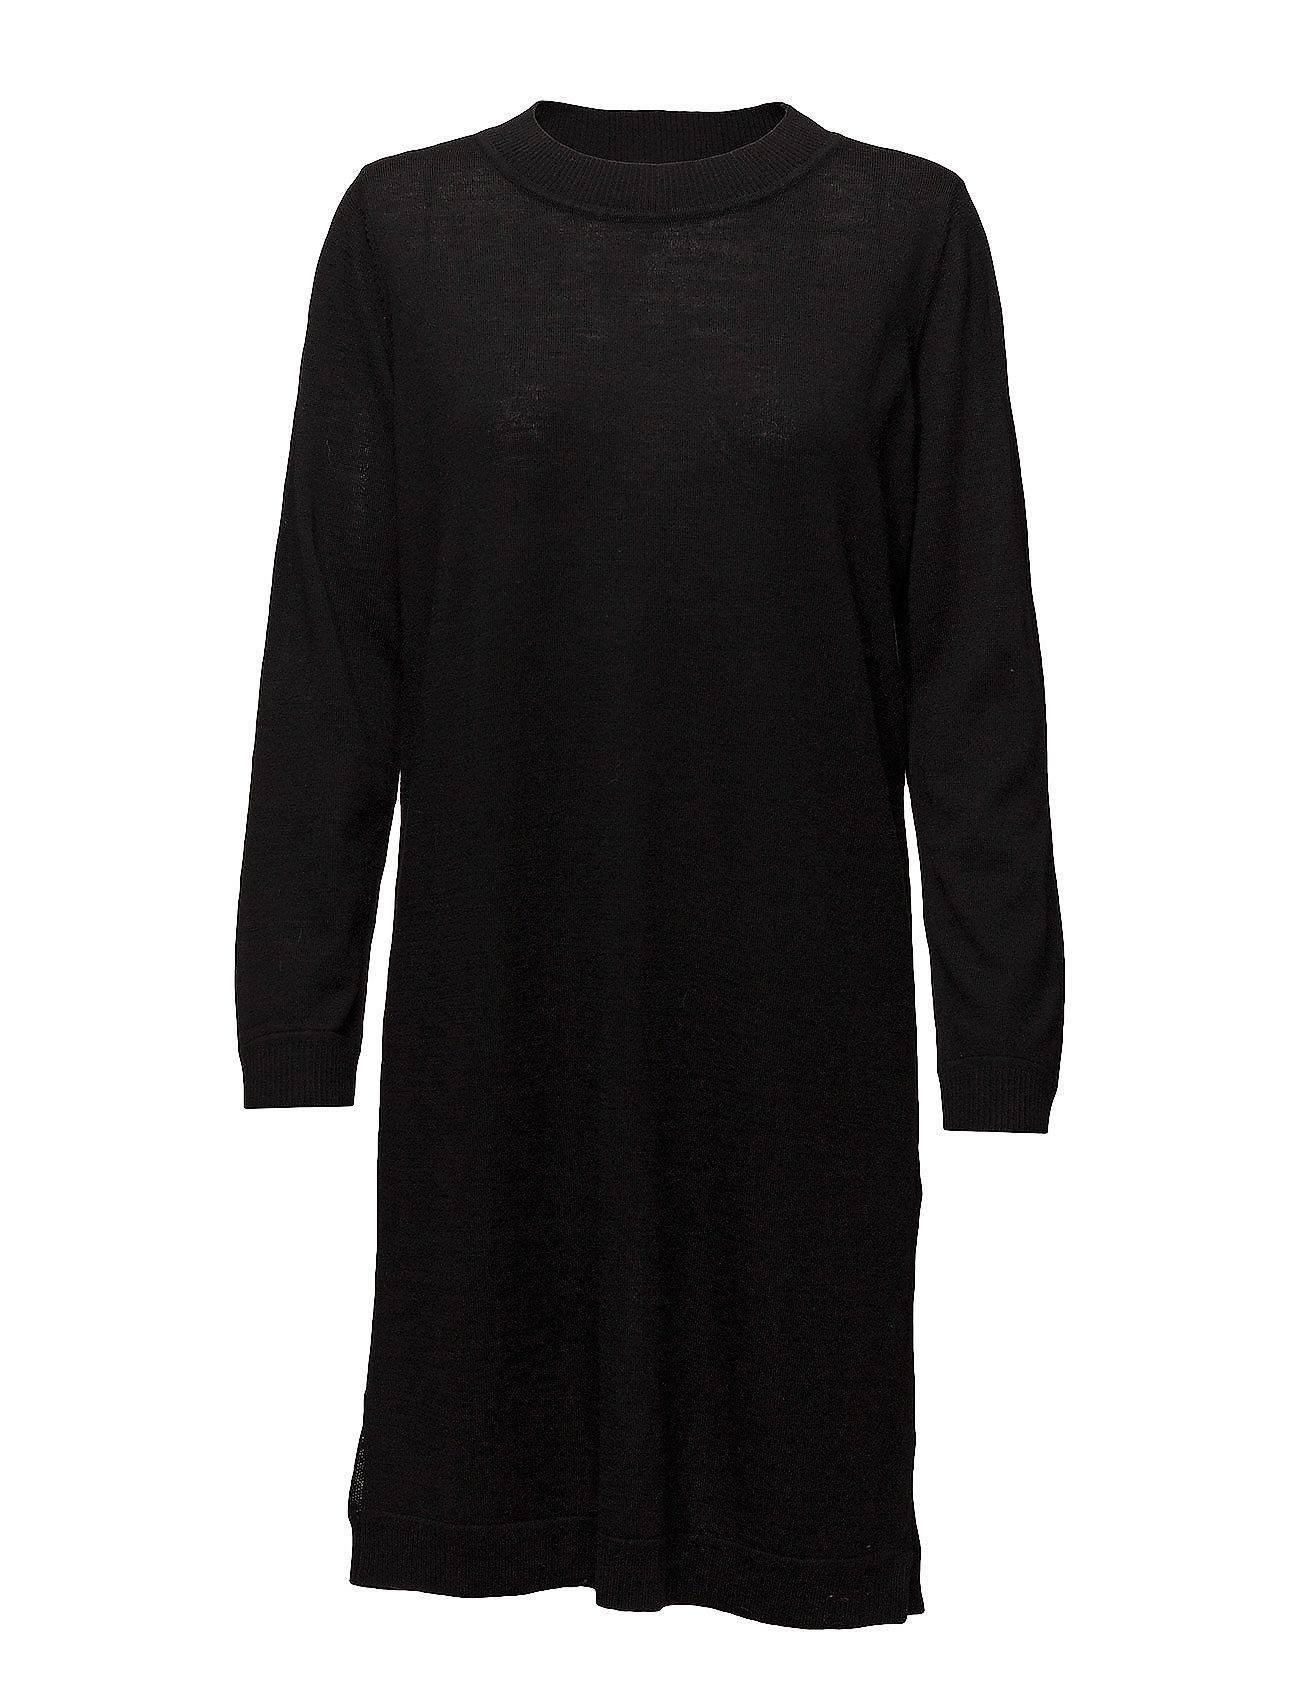 Selected Femme SFEILEEN LS KNIT O-NECK DRESS NOOS - BLACK